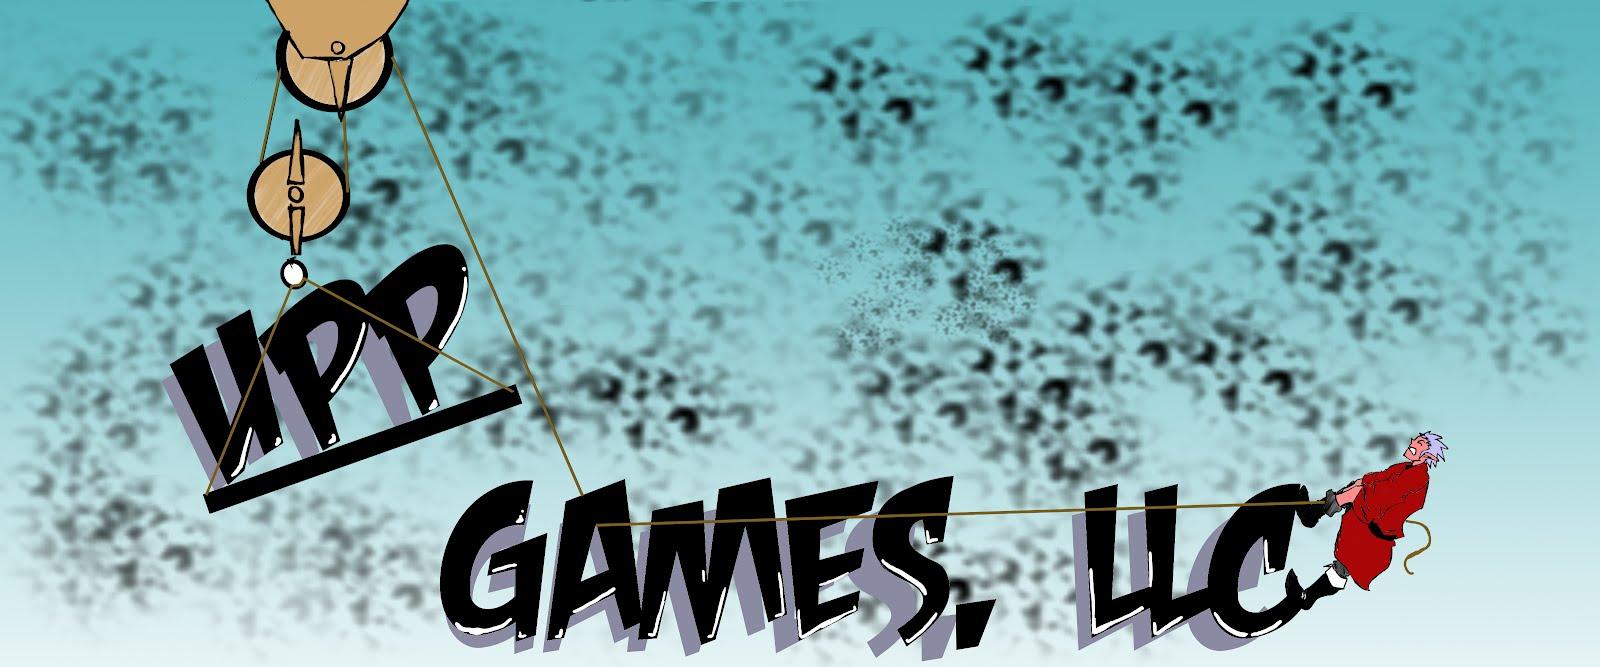 UPPGames LLC